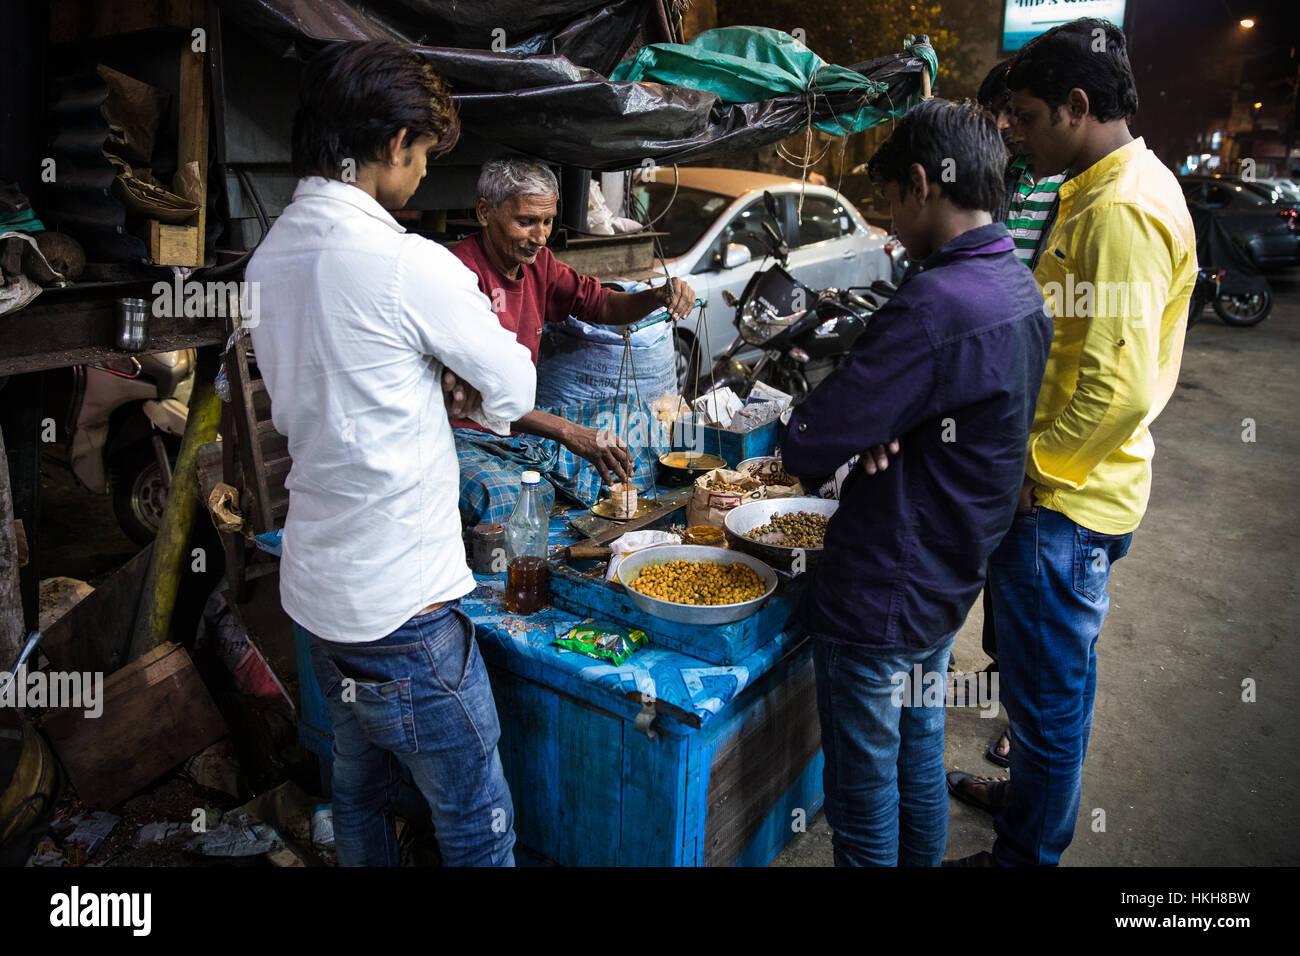 A street vendor sells nuts in Kolkata (Calcutta), West Bengal, India. - Stock Image